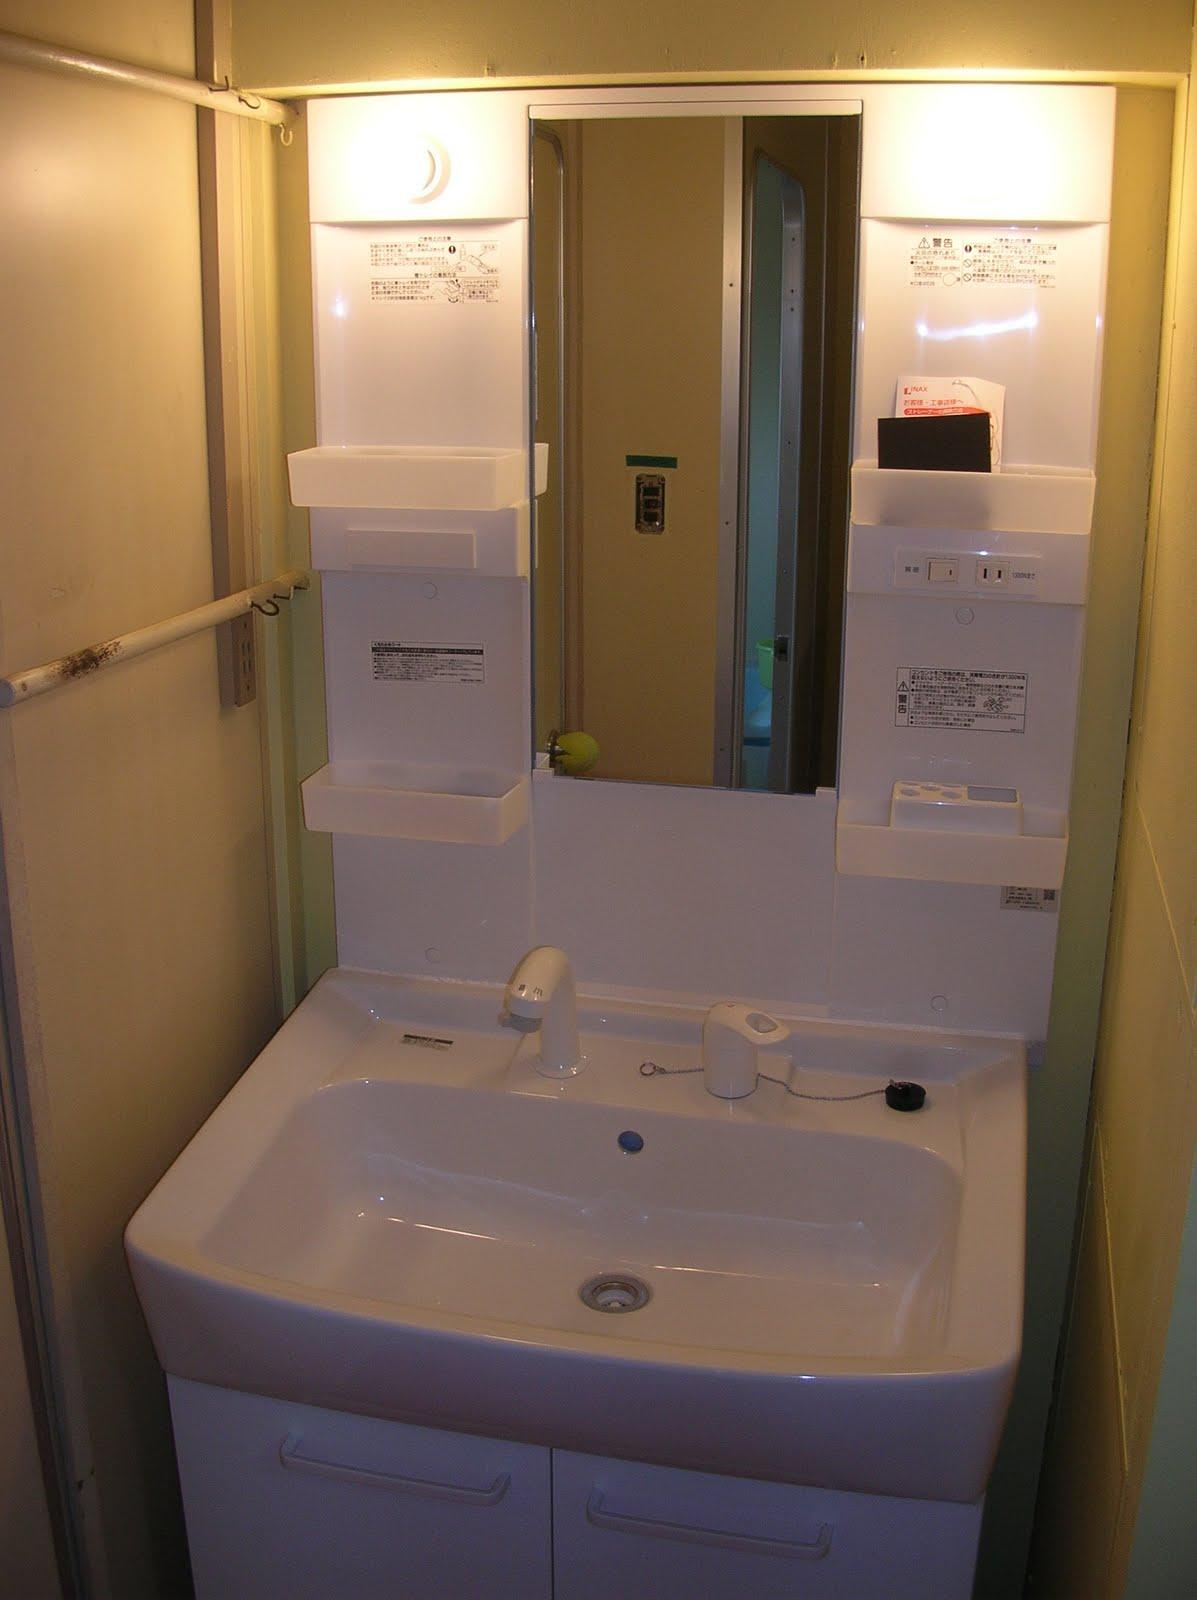 sophia's blog : 【diy】洗面台+化粧台を交換しました-bathroom vanity